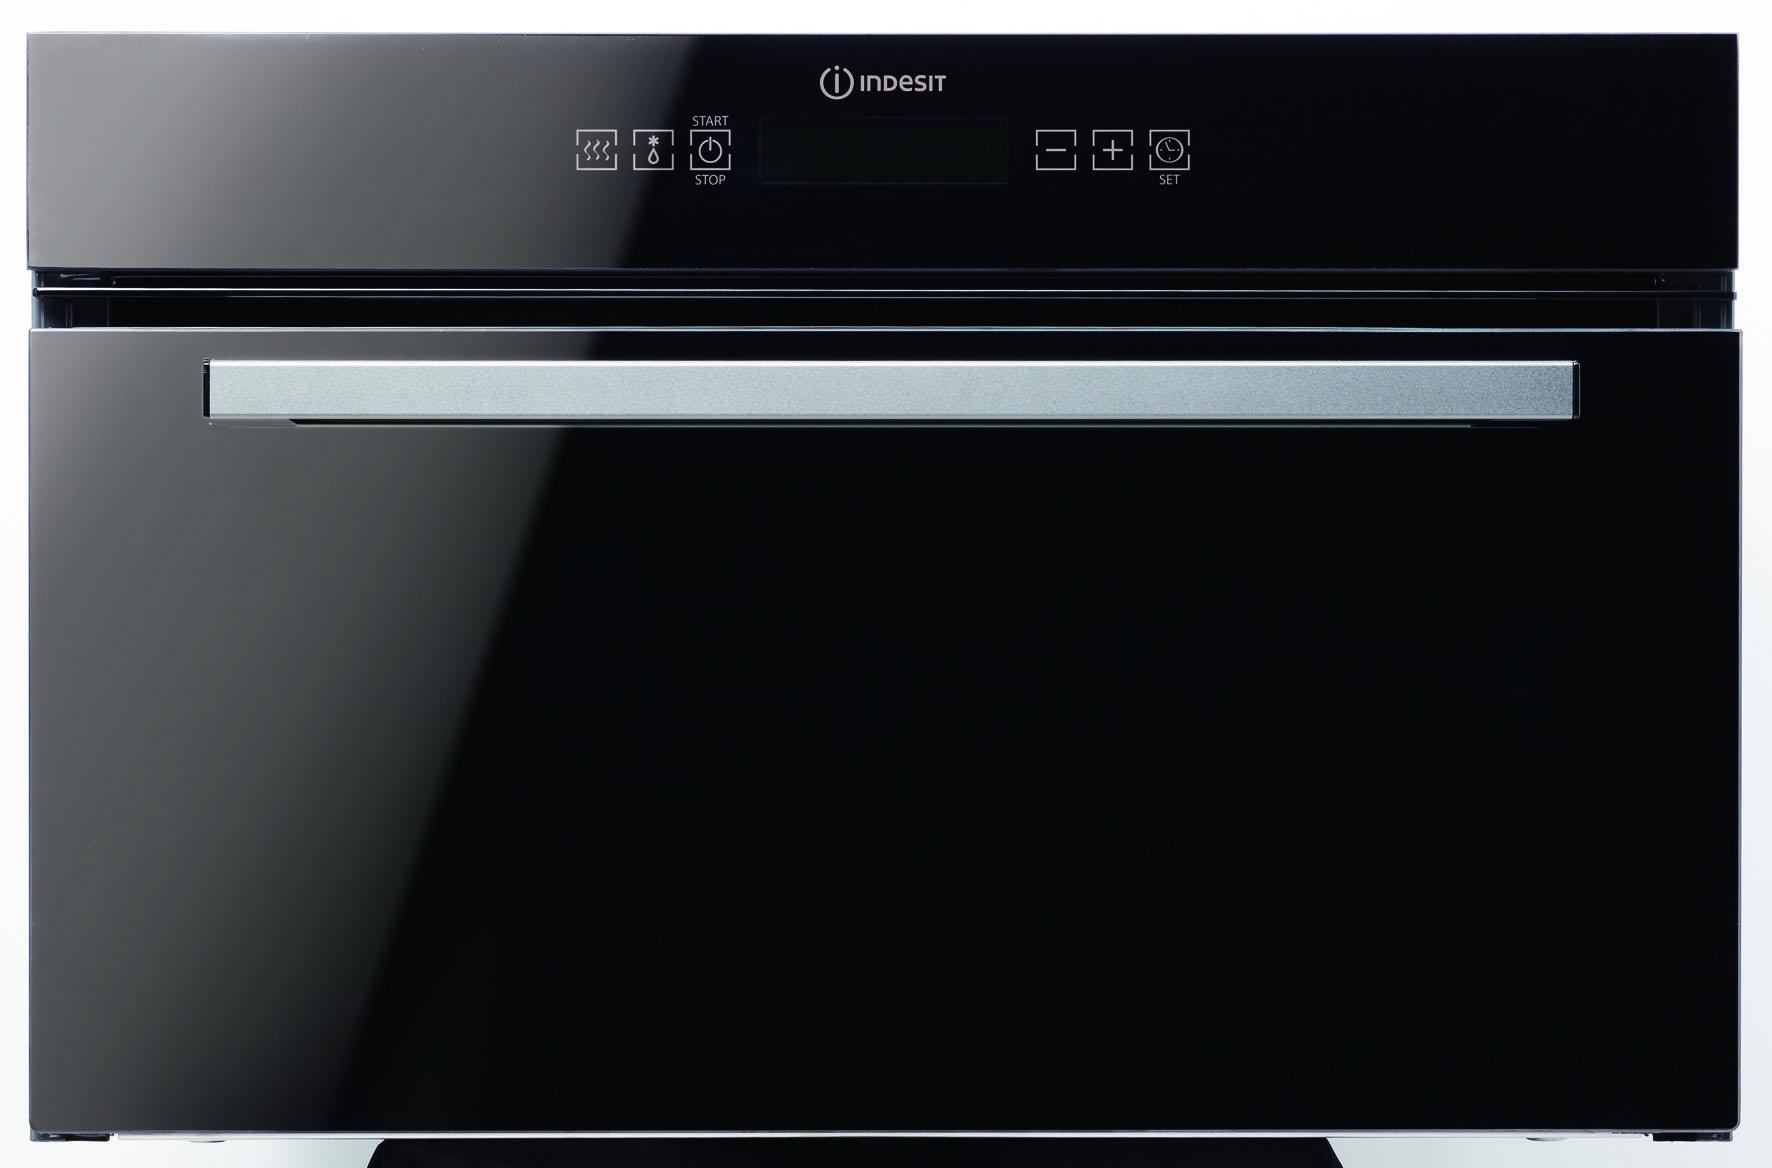 SIM100 INDESIT 英迪新 鏡面雙溫觸控蒸爐 零利率 熱線:07-7428010